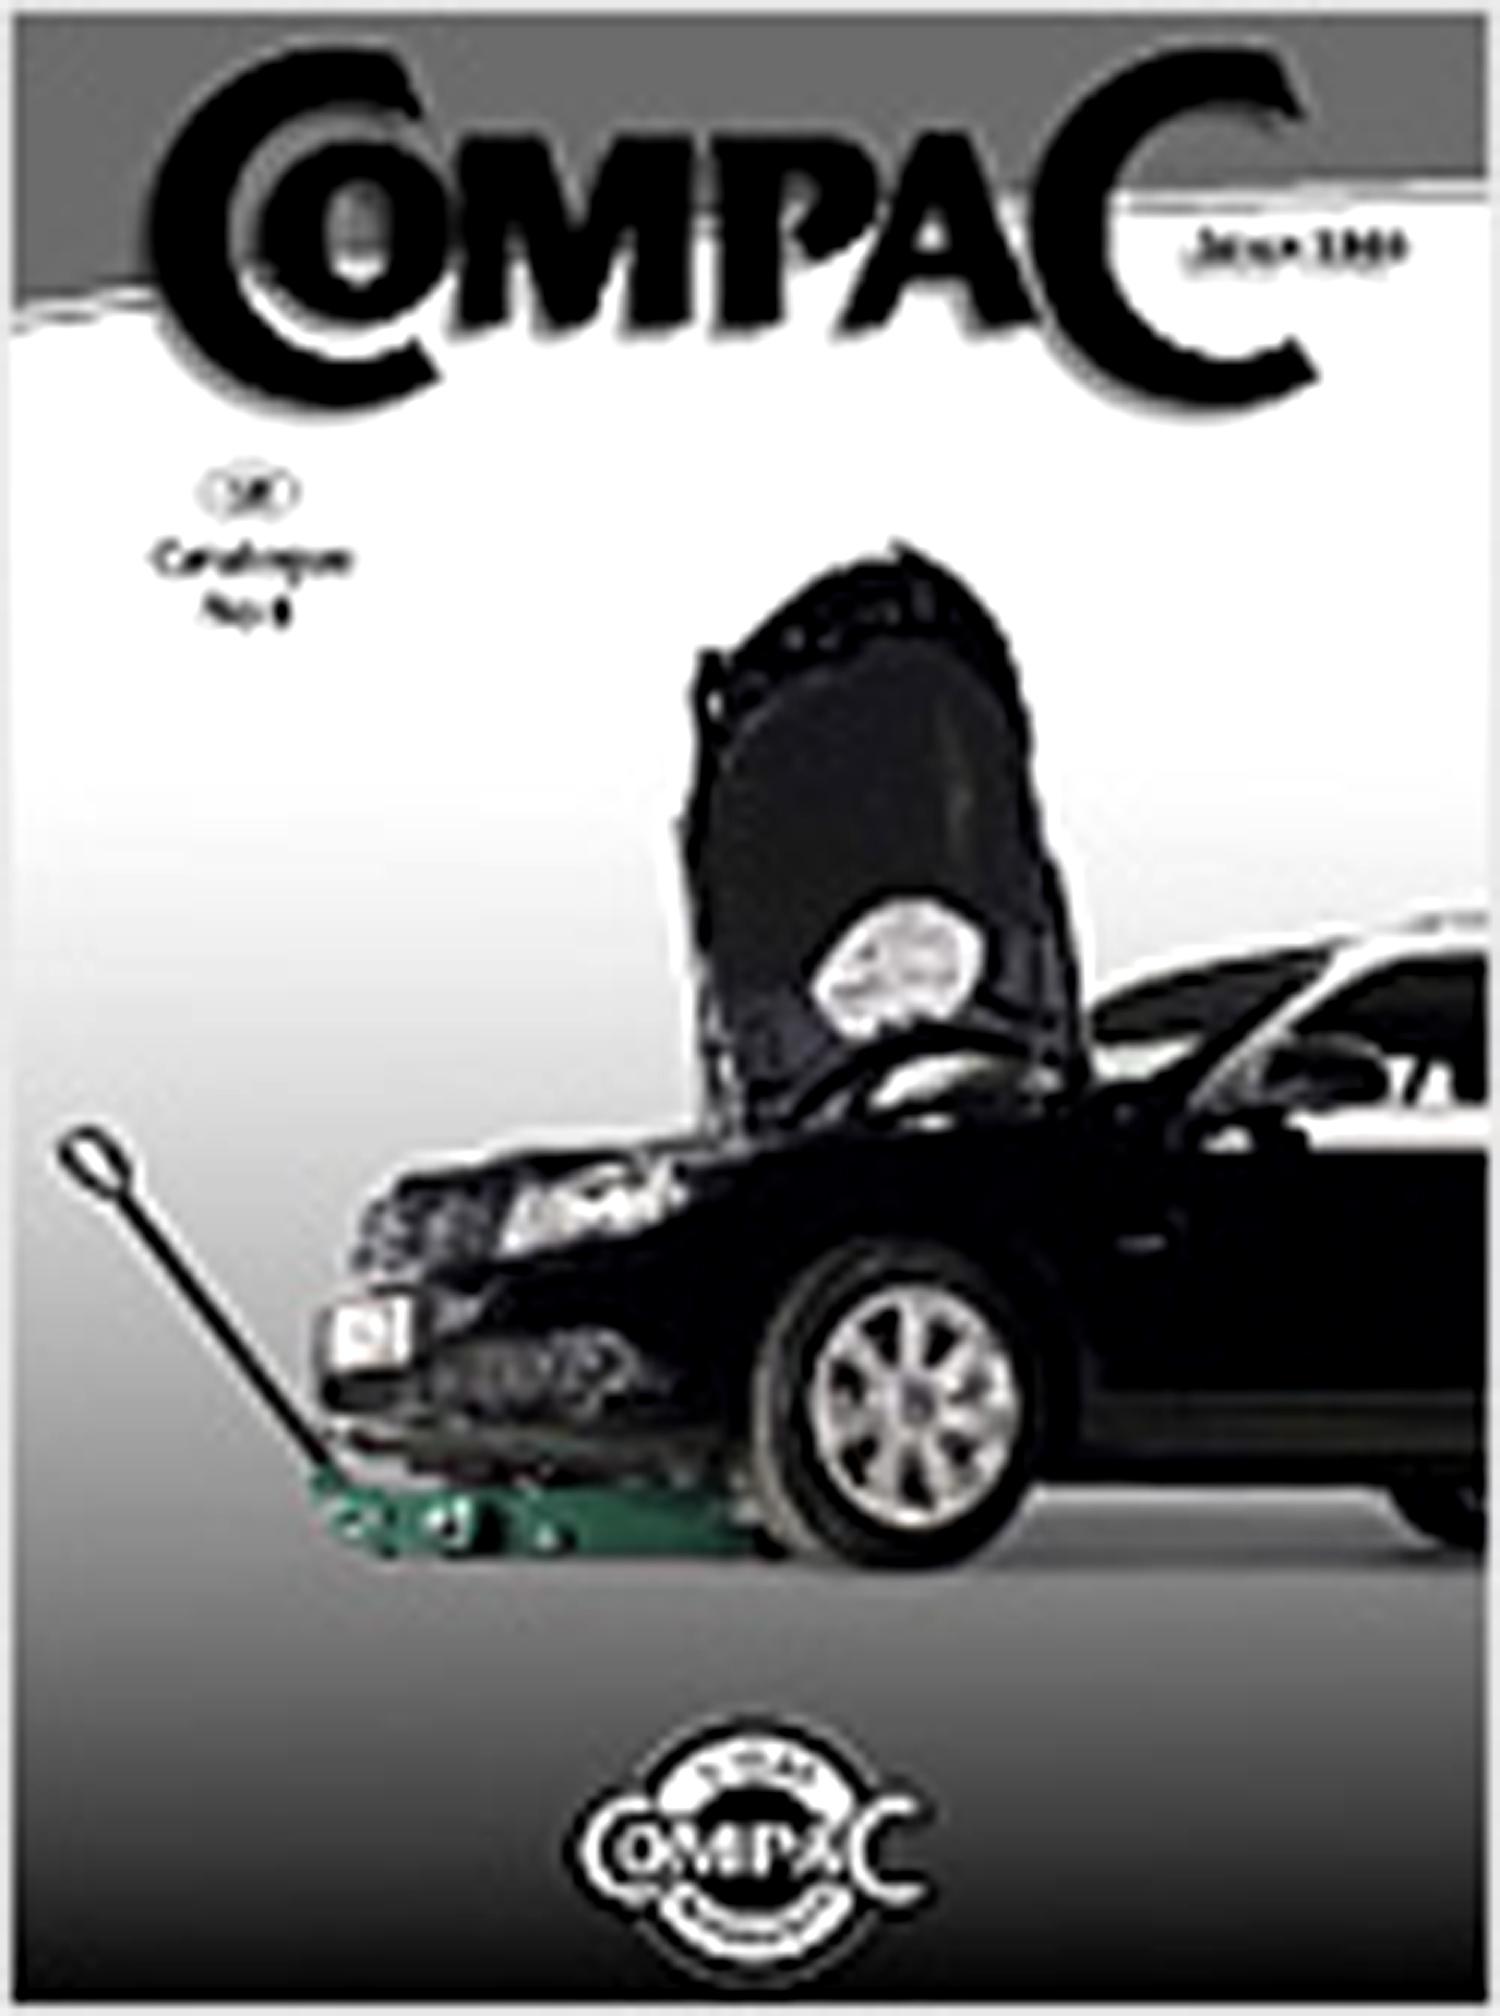 Compac denmark floor jack 4-20ton